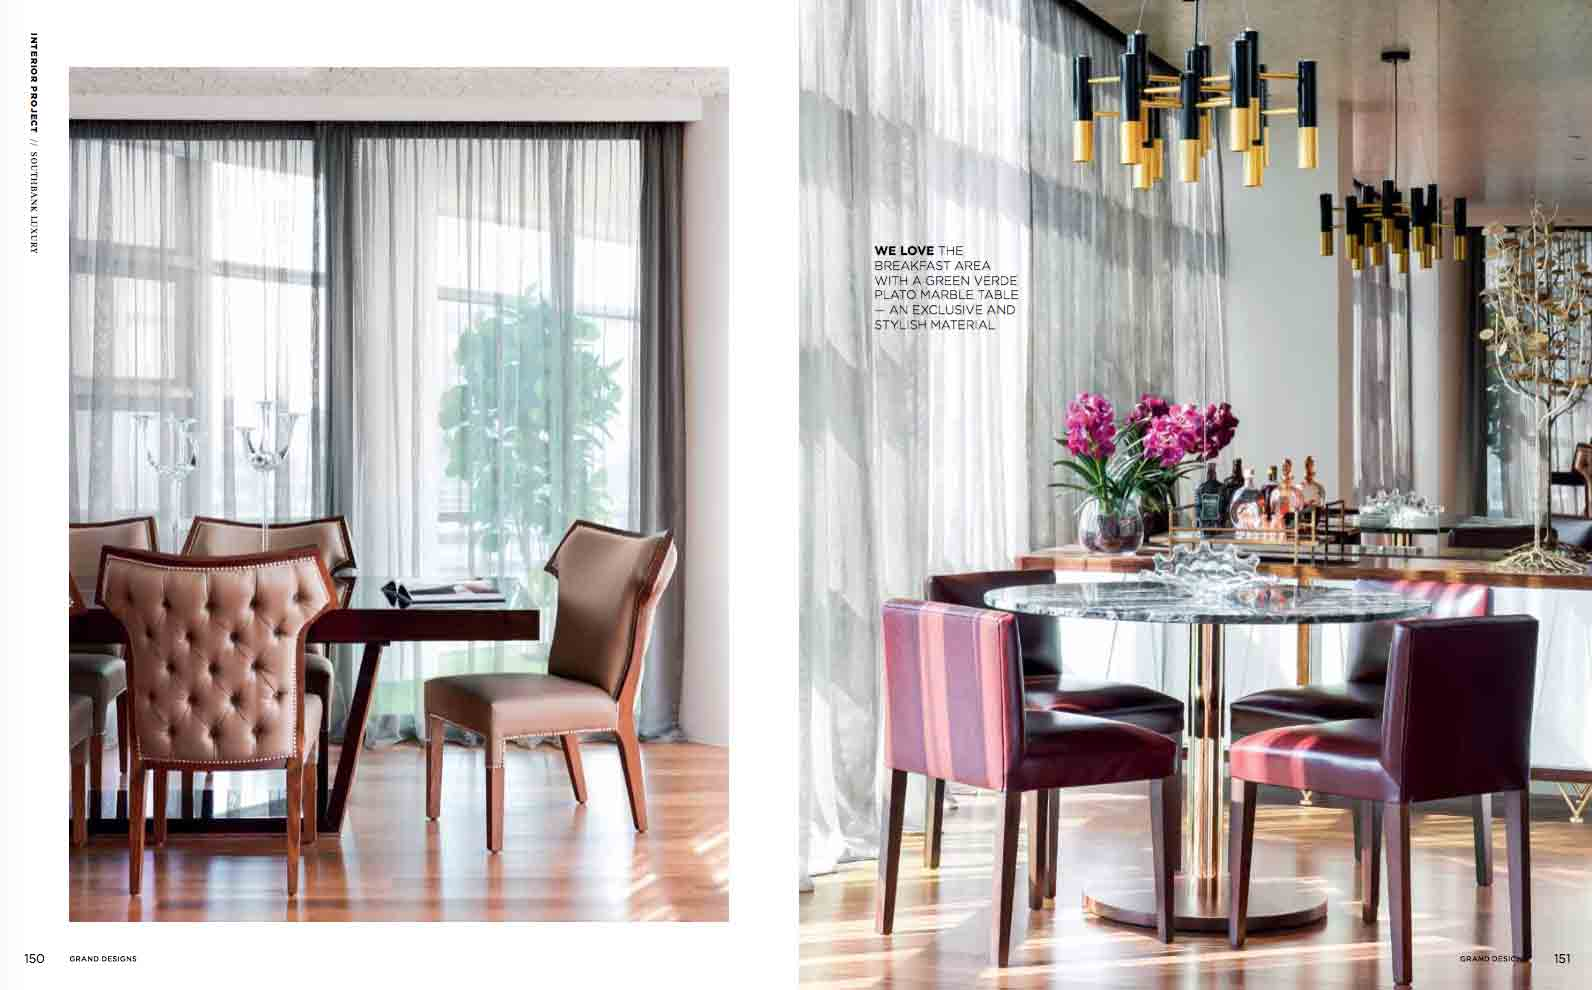 alexander pollock in grand designs australia issue 5 4. Black Bedroom Furniture Sets. Home Design Ideas